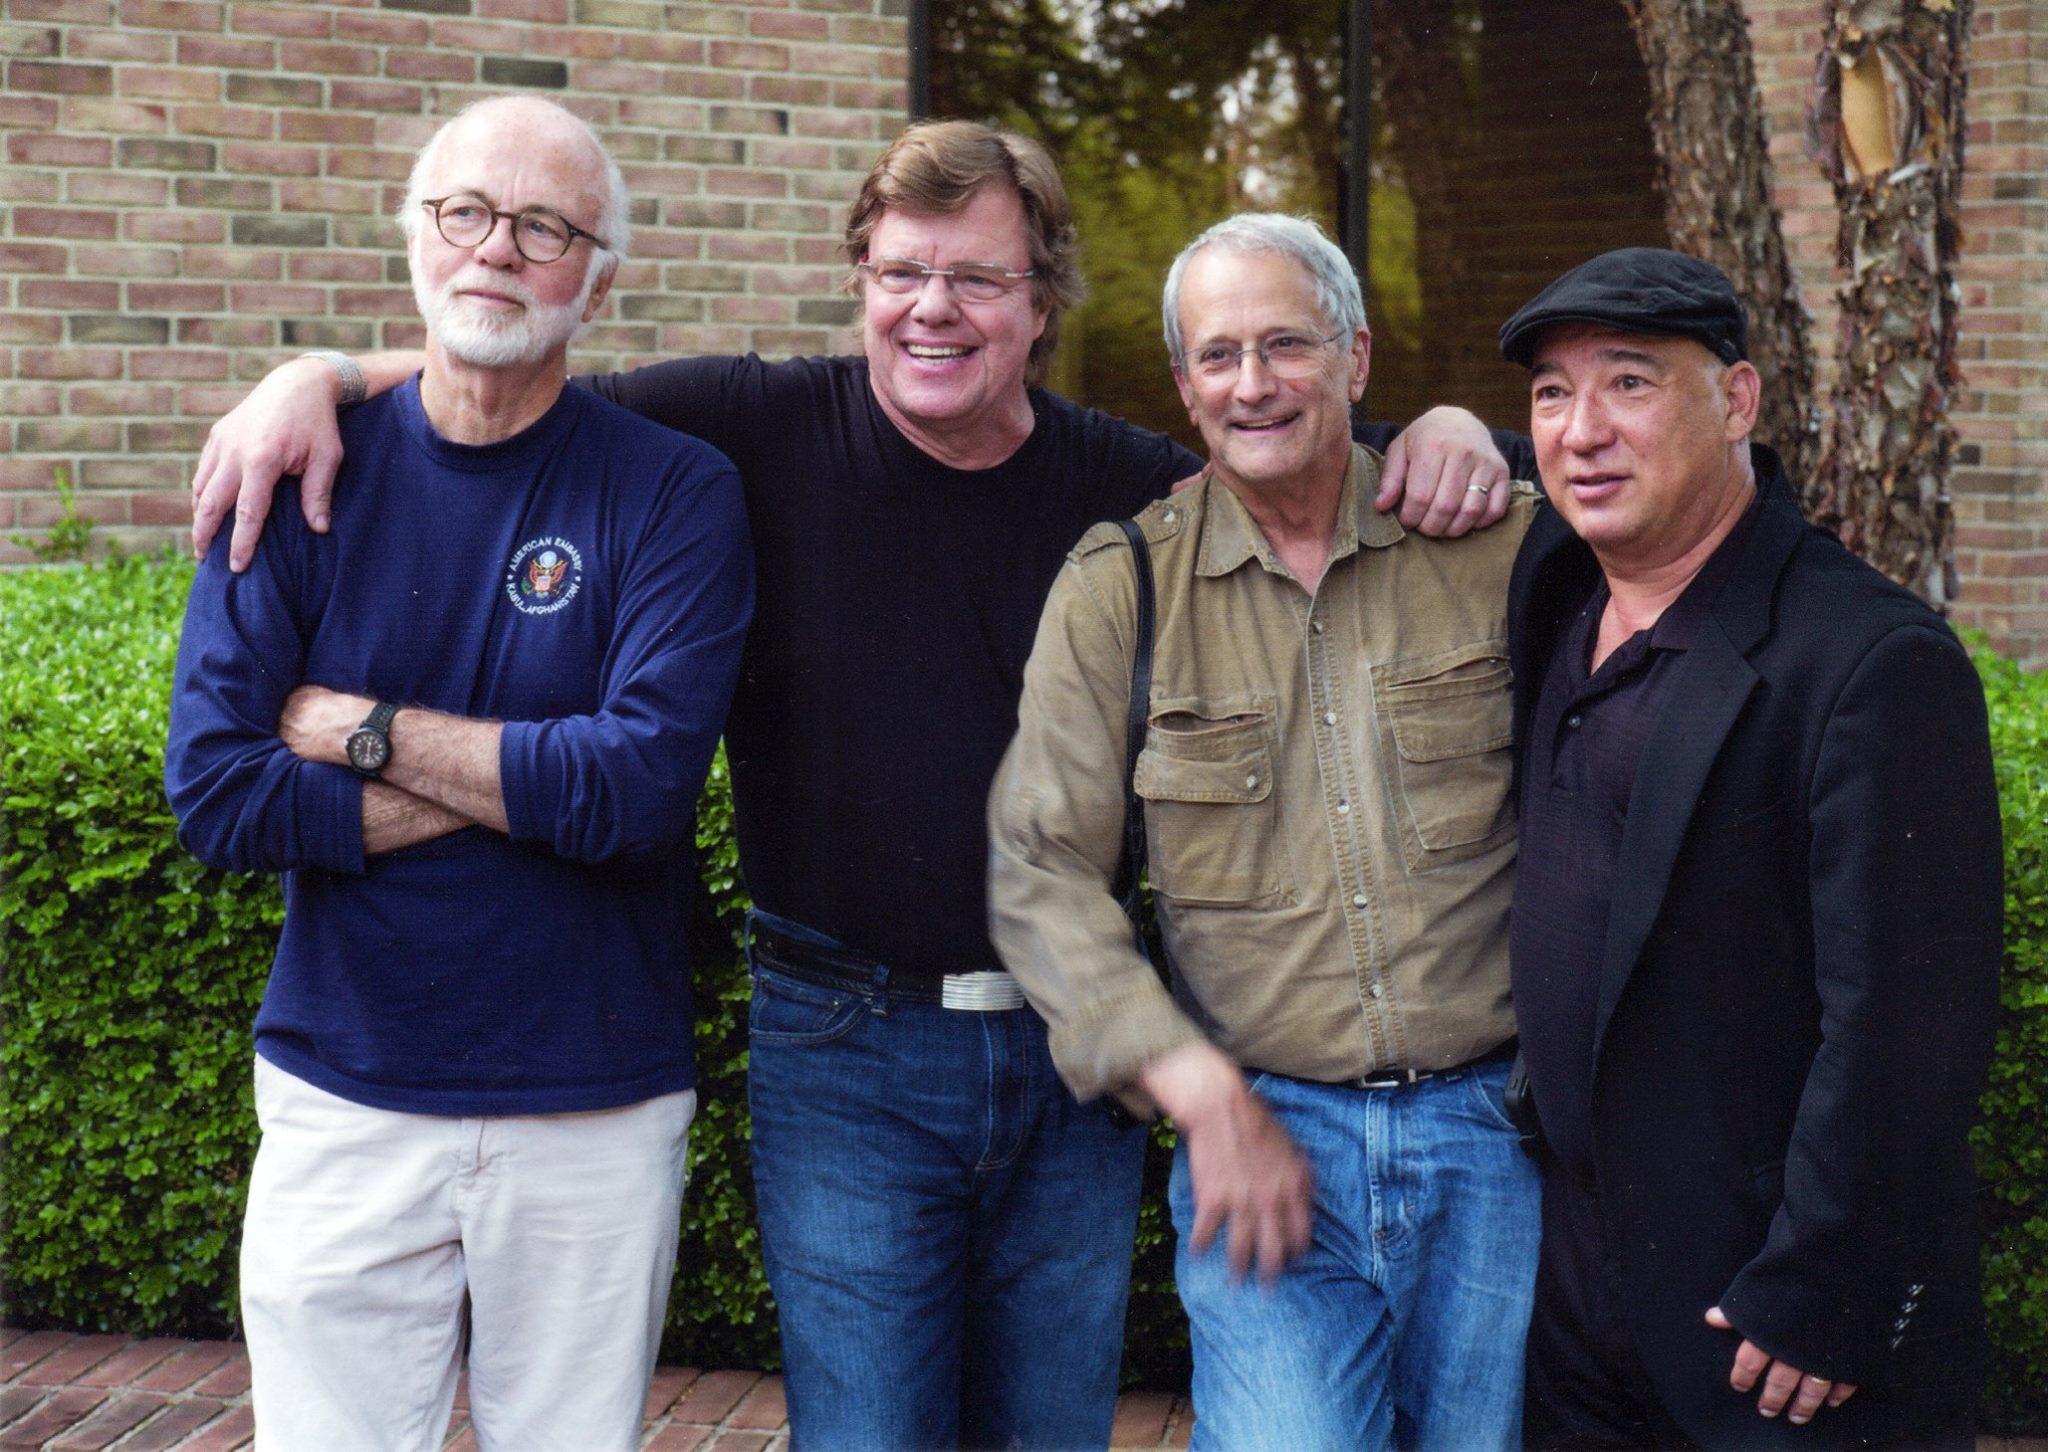 The Four Amigos: Kennerly, McNally, Burnett, Colton. © 2015 Roger Hart